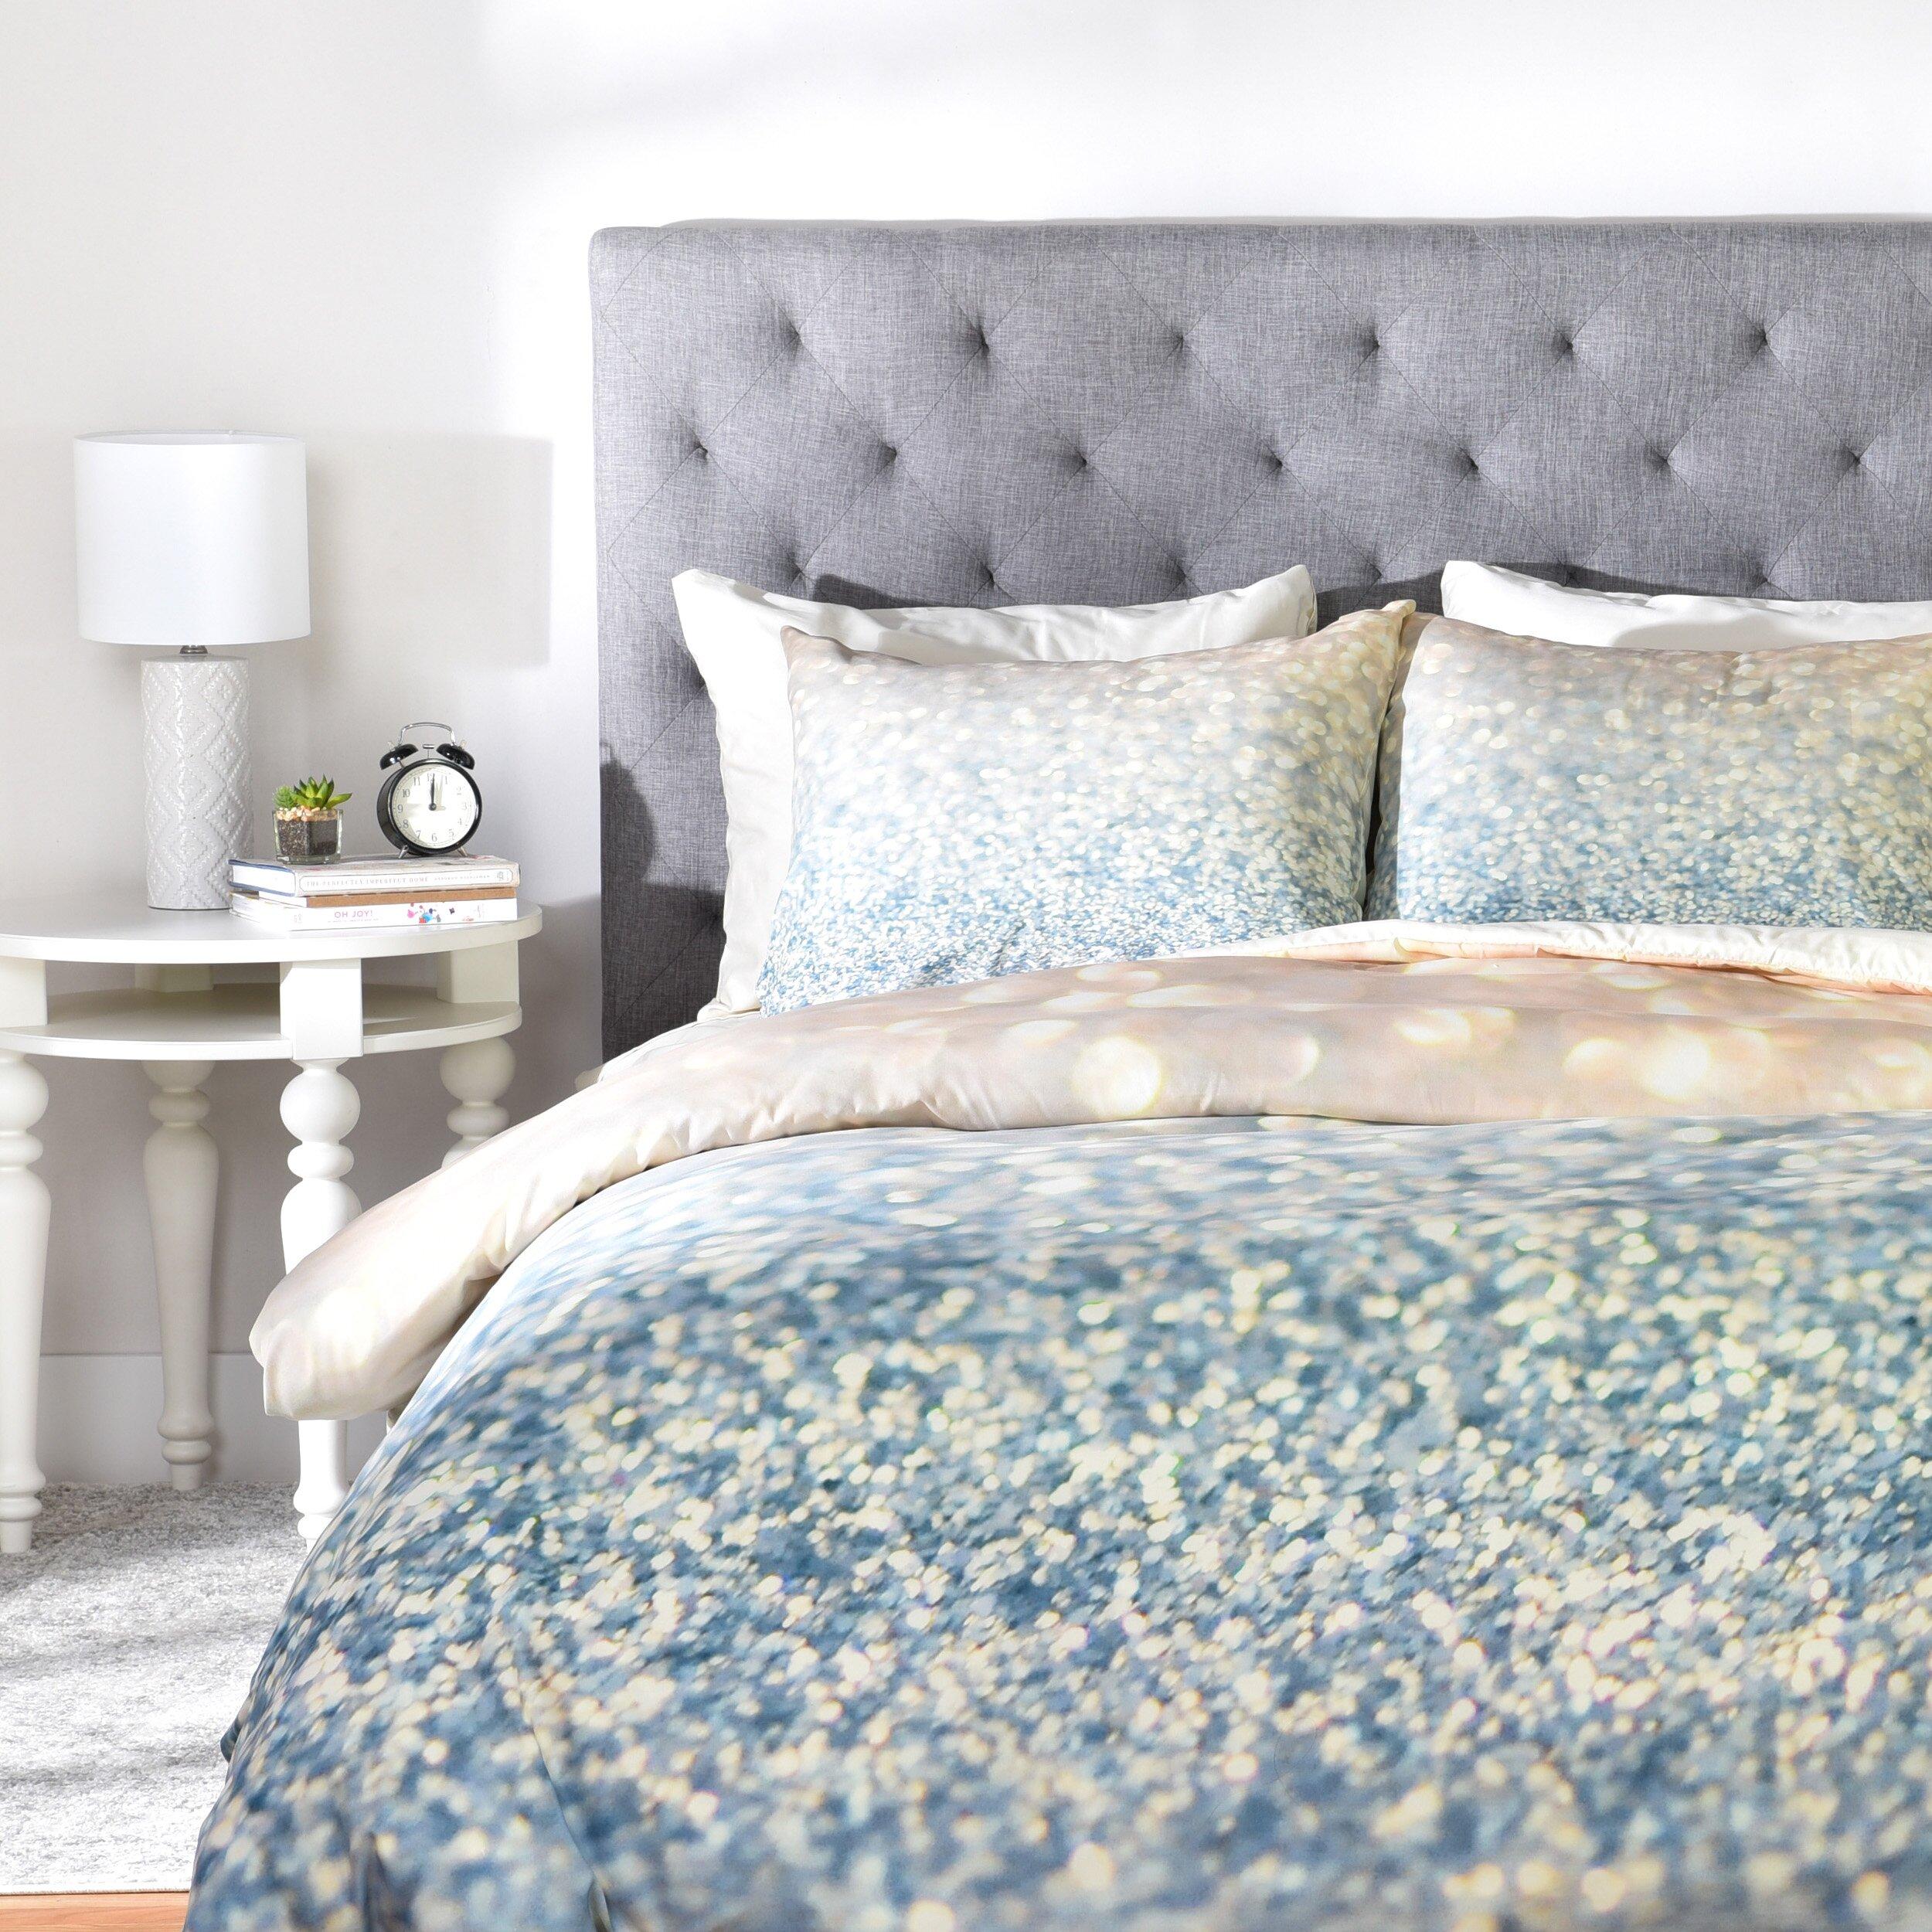 Brayden studio martinek duvet cover collection reviews for Studio one bed cover